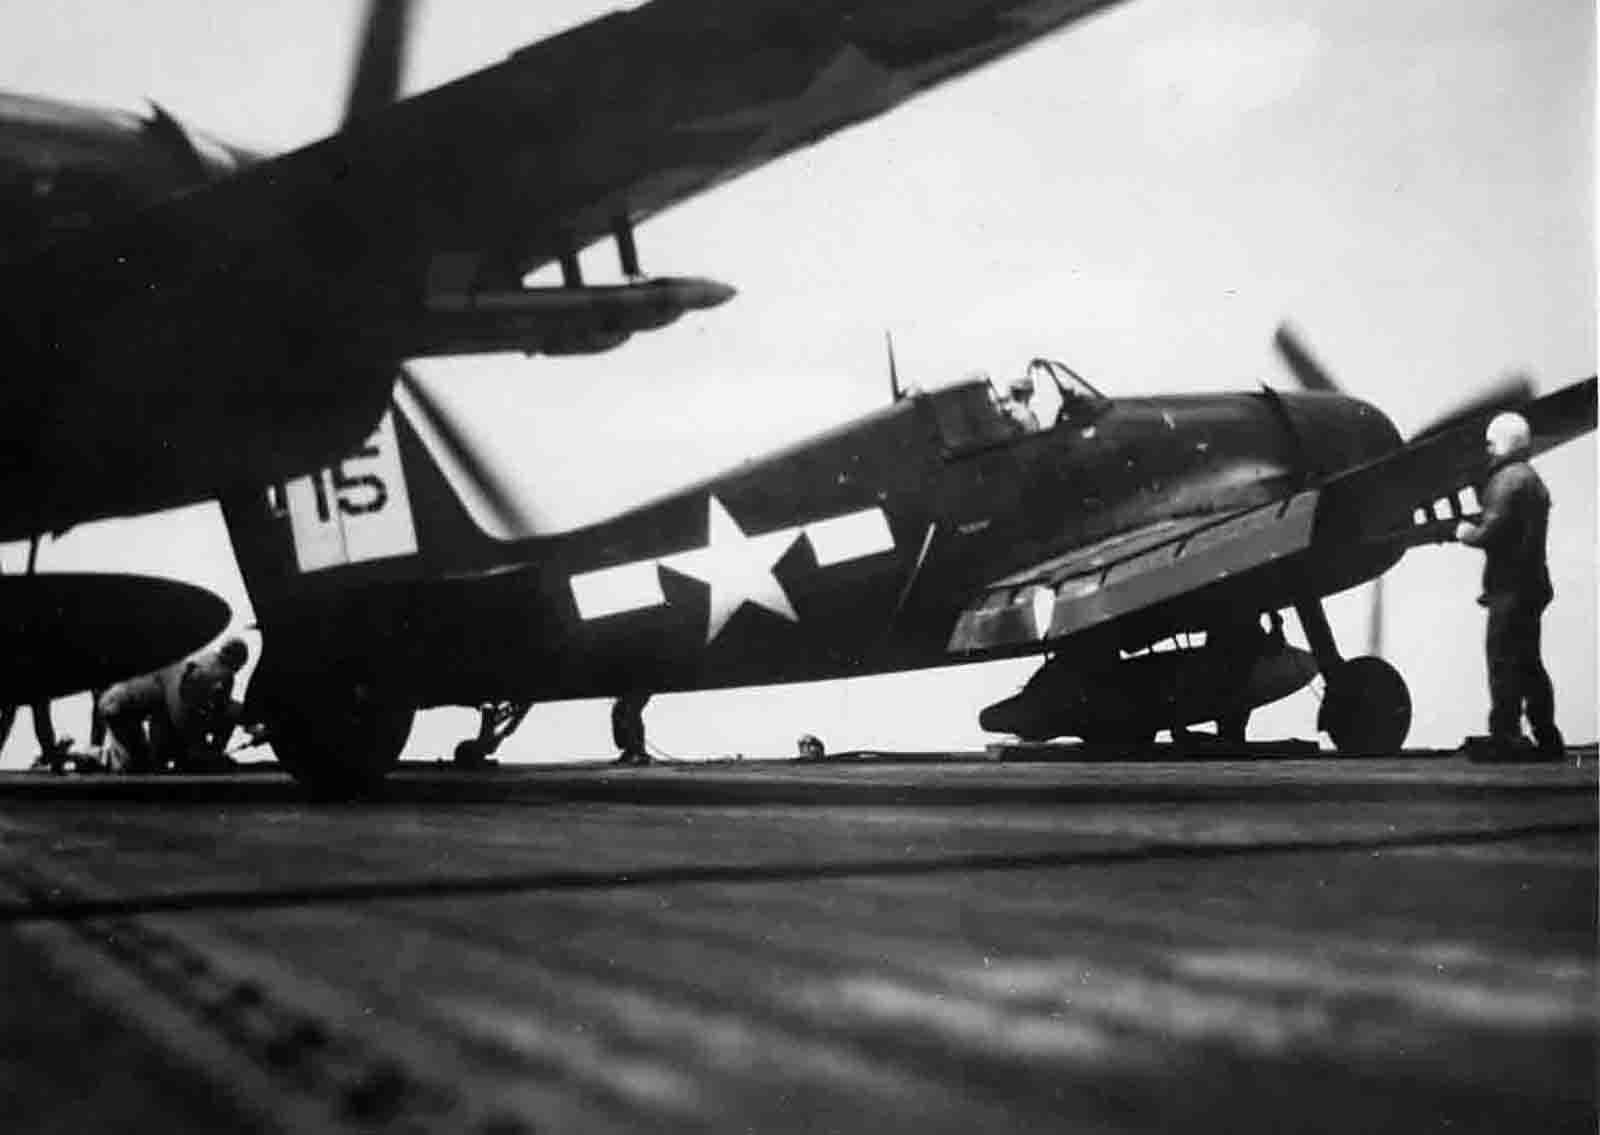 Grumman F6F 5 Hellcat VF 42 Black 15 preparing for launch CVL 30 USS San Jacinto 01